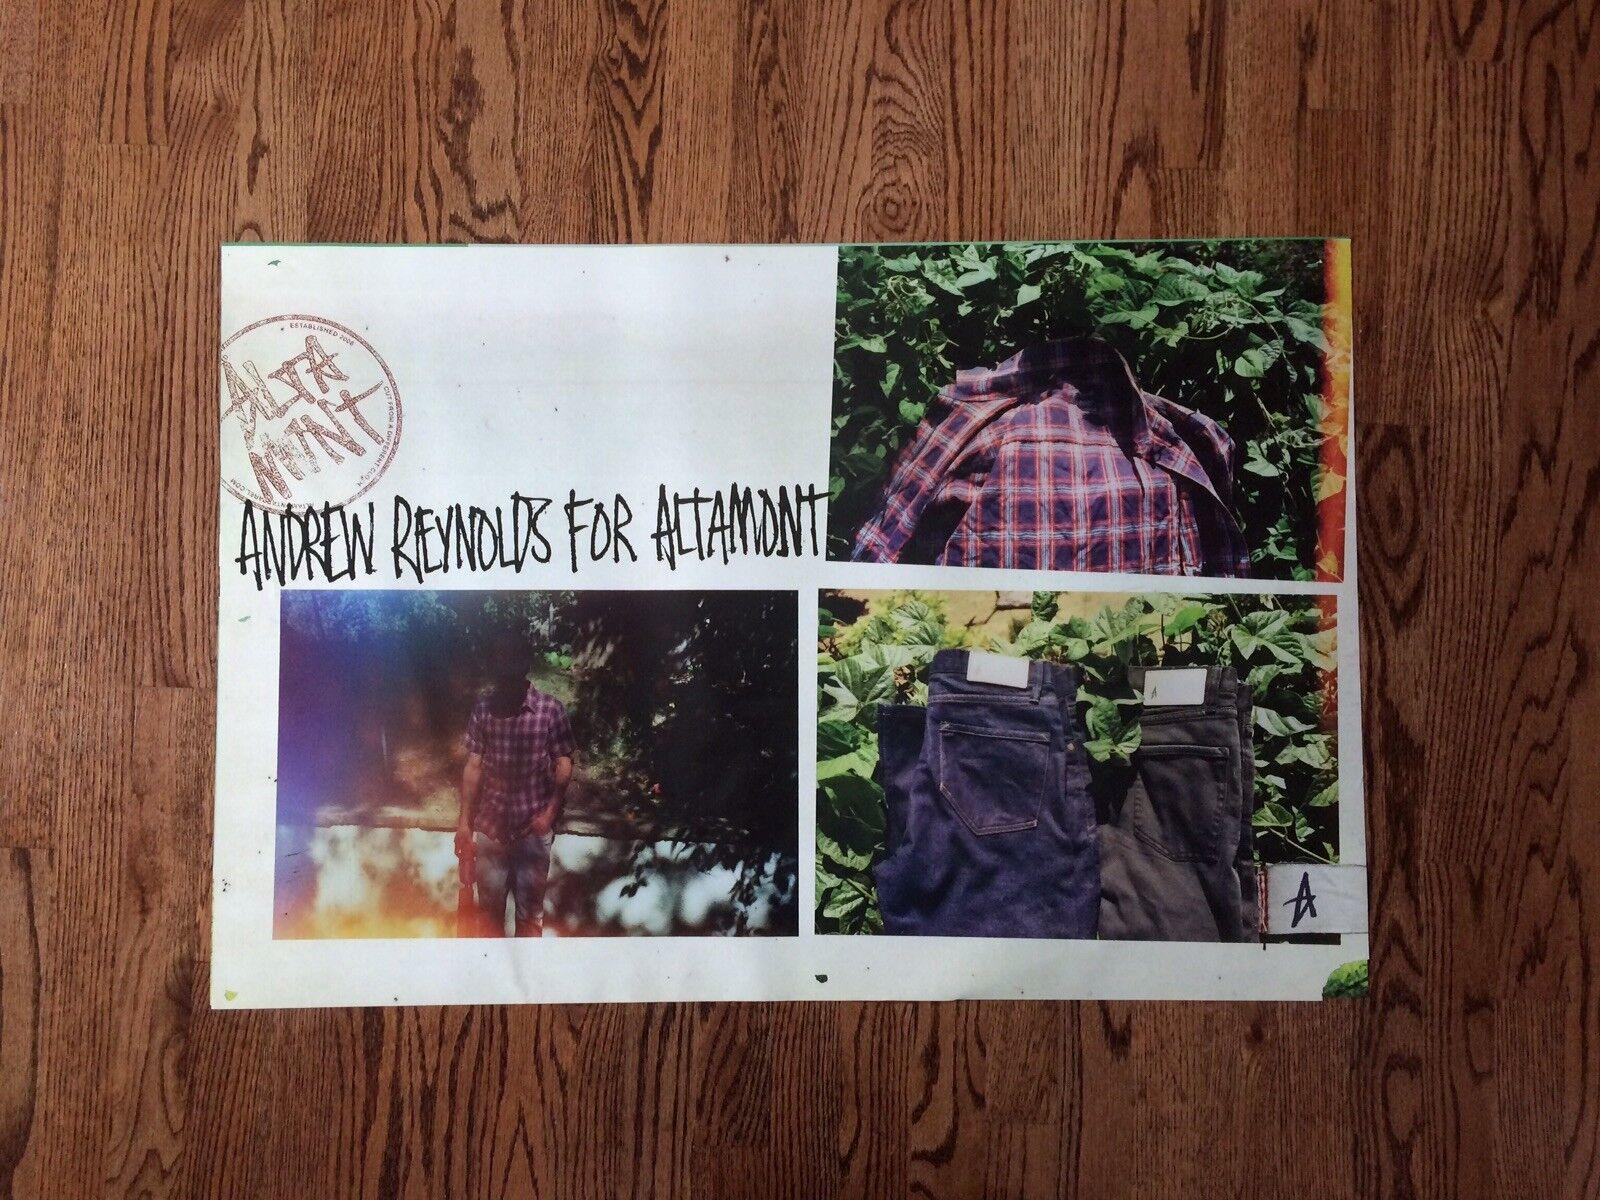 Altamont Shop Poster Rare Andrew Reyonlds Baker Deathwish